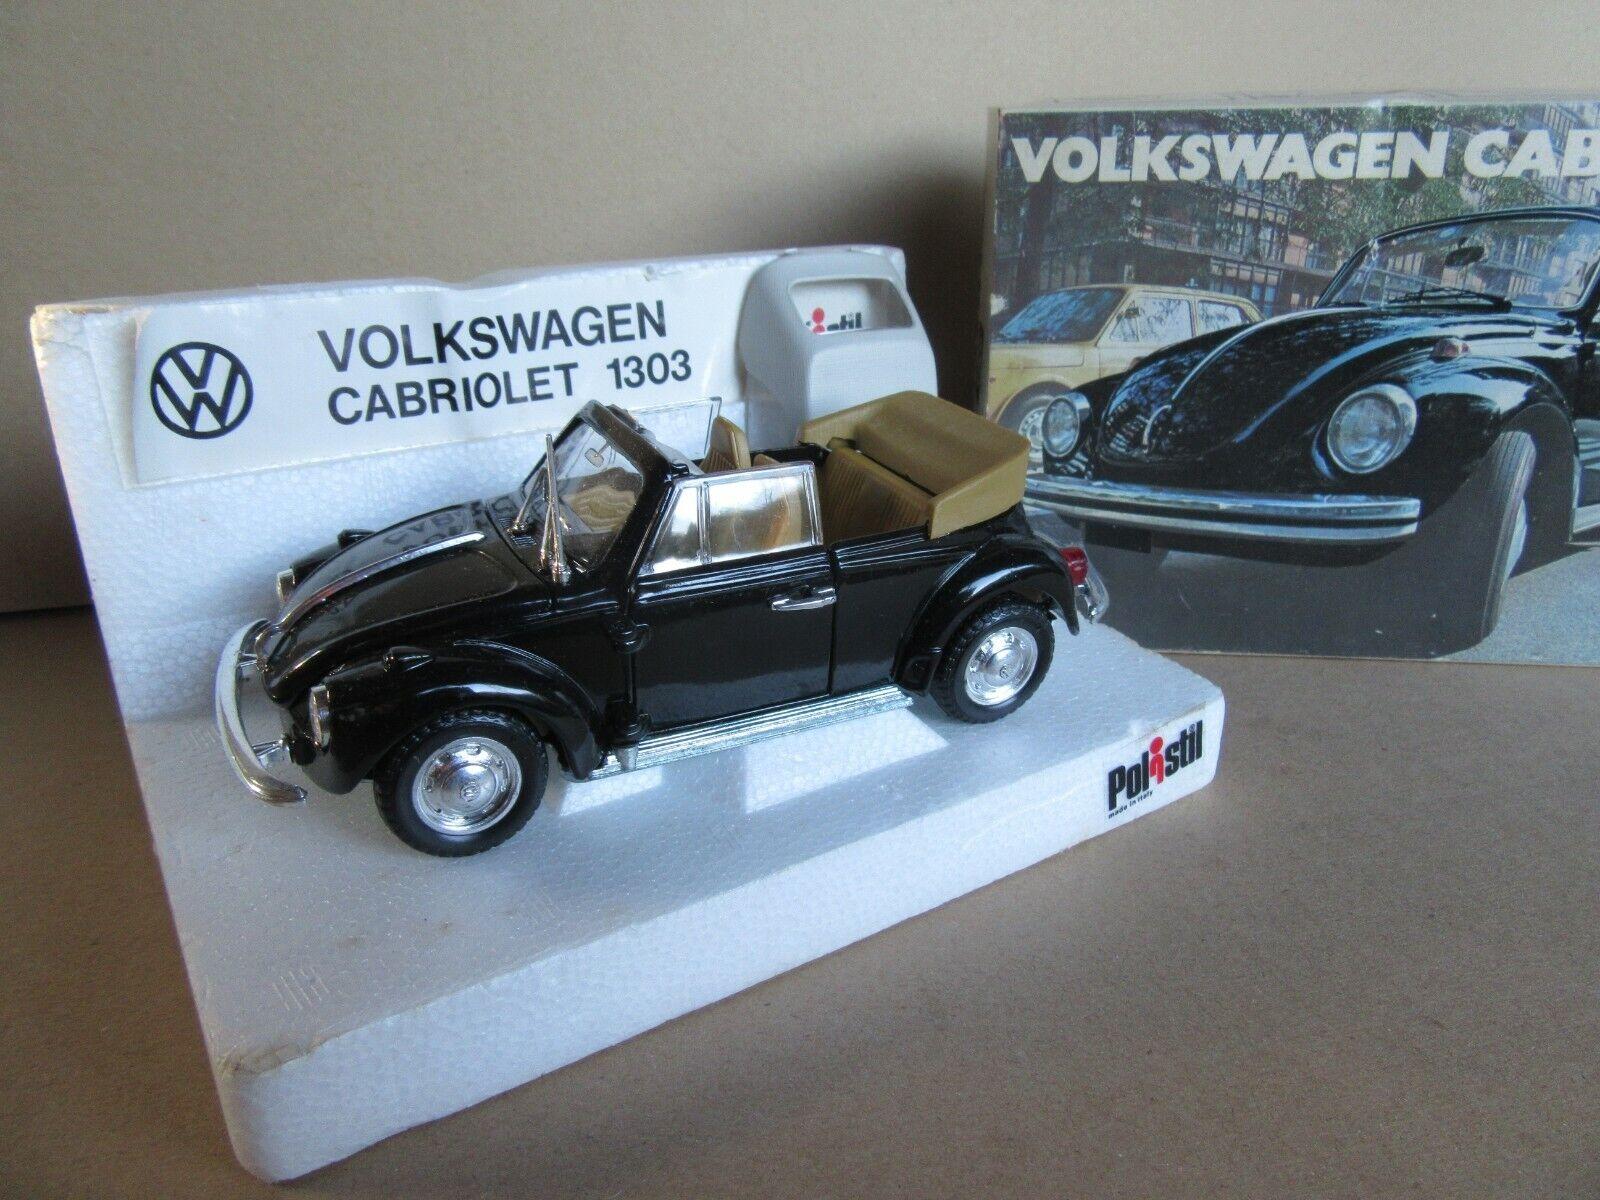 838L Polistil S15 Italien Volkswagen Cabriolet 1303 VW Schwarz 1 25